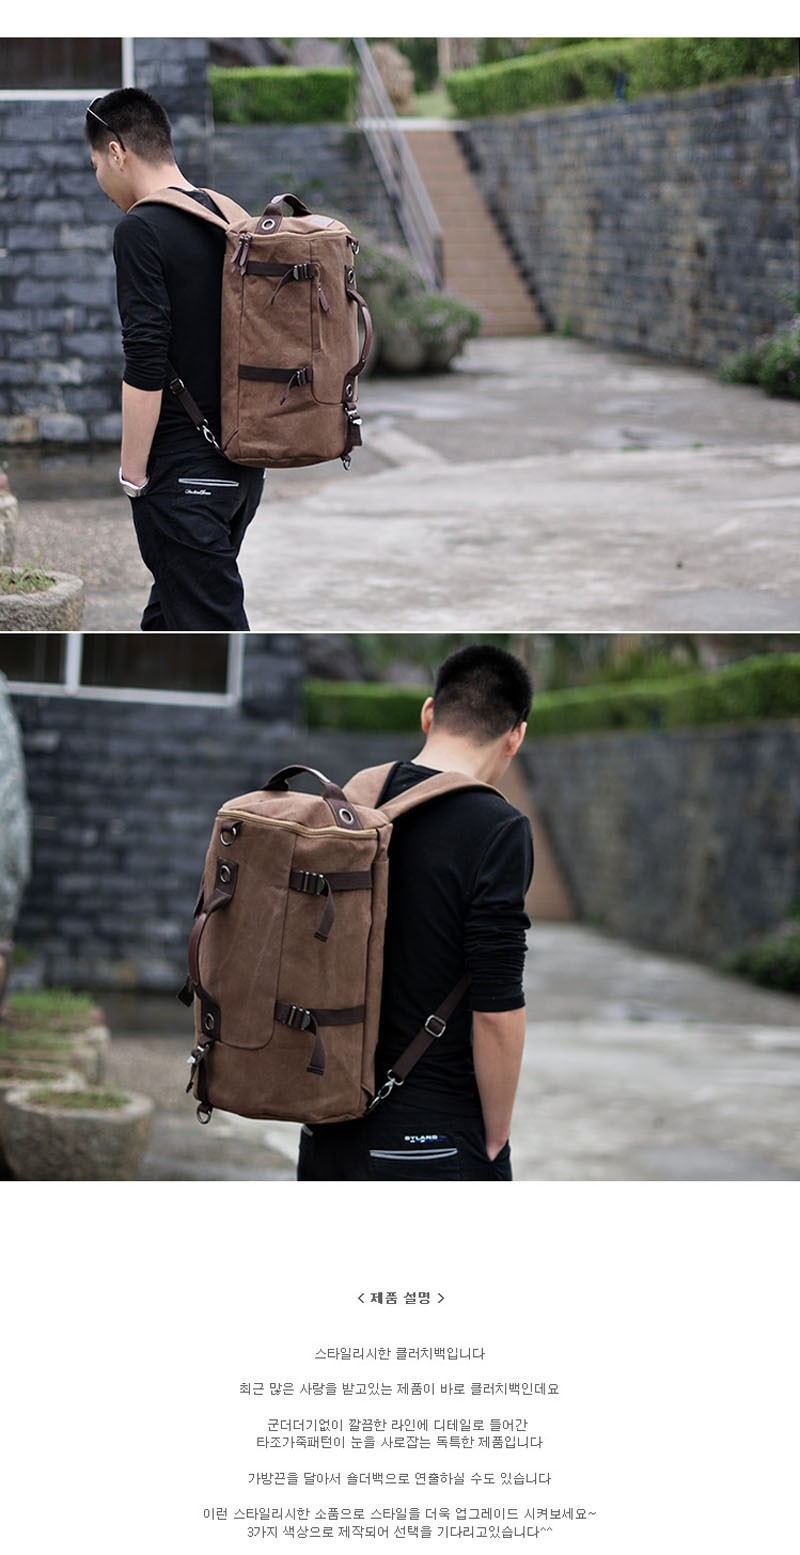 Men's Multi-Functional Backpack Vintage Shoulder Bag High Quality Canvas Male Bagpack Rucksack Travel Luggage for Weekend 36